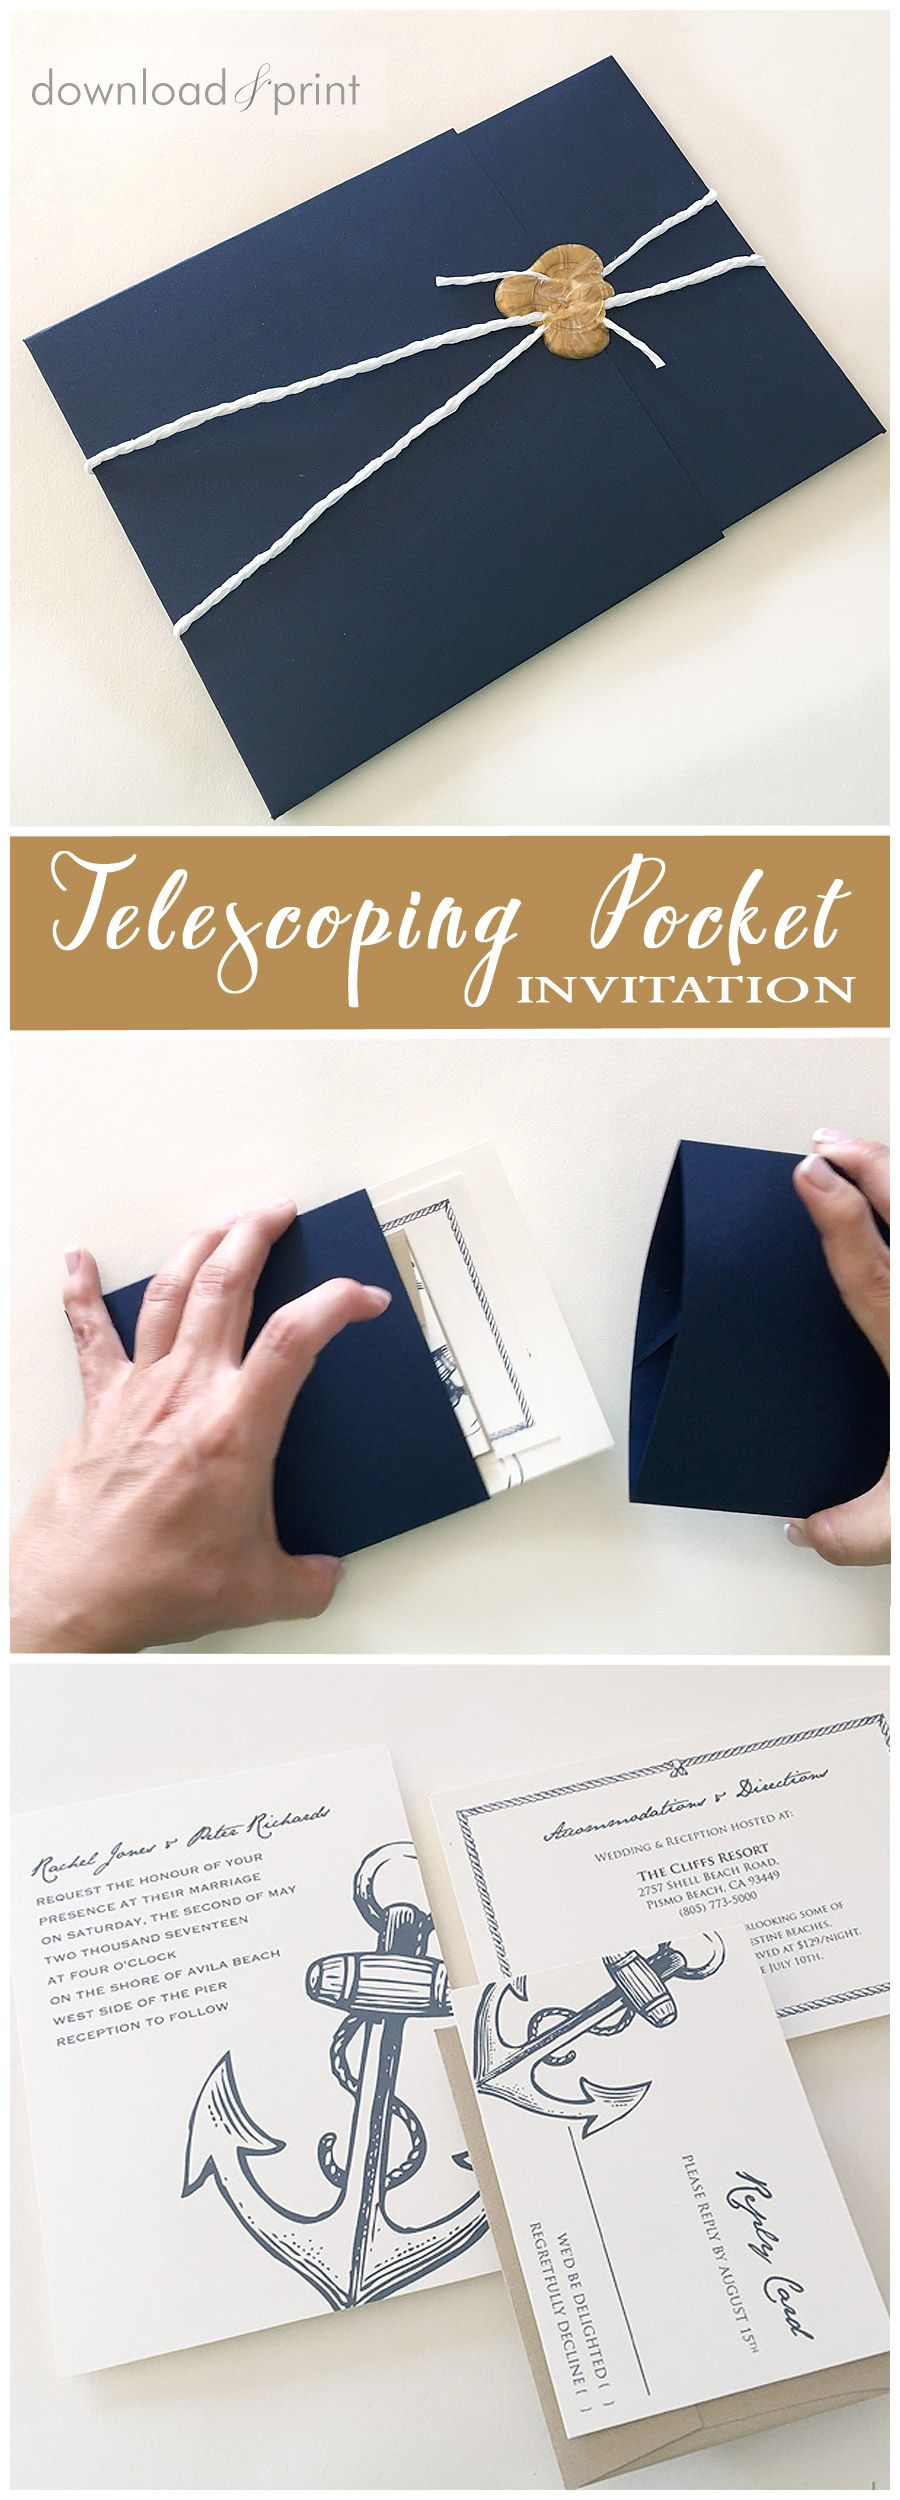 Unique telescoping pocket wedding invitation Hack from